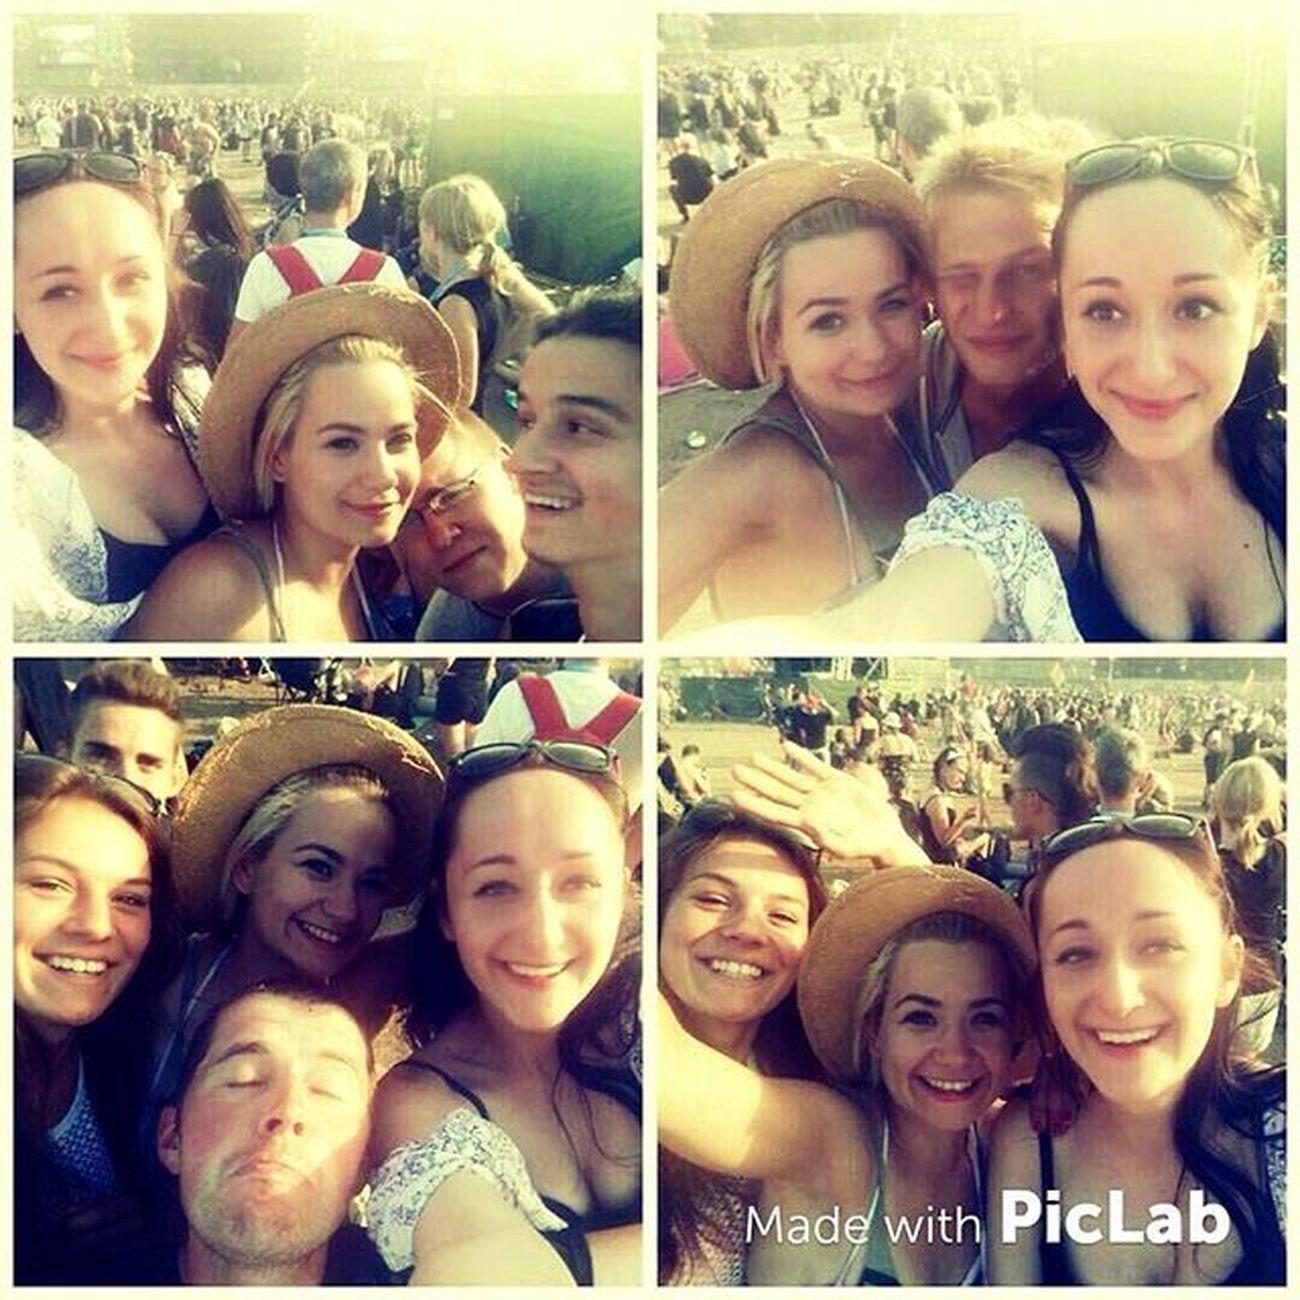 Woodstock Lovewoodstock Selfie Festiwal Kocham_was Instaday Instagood Polishgirl Polishwoman